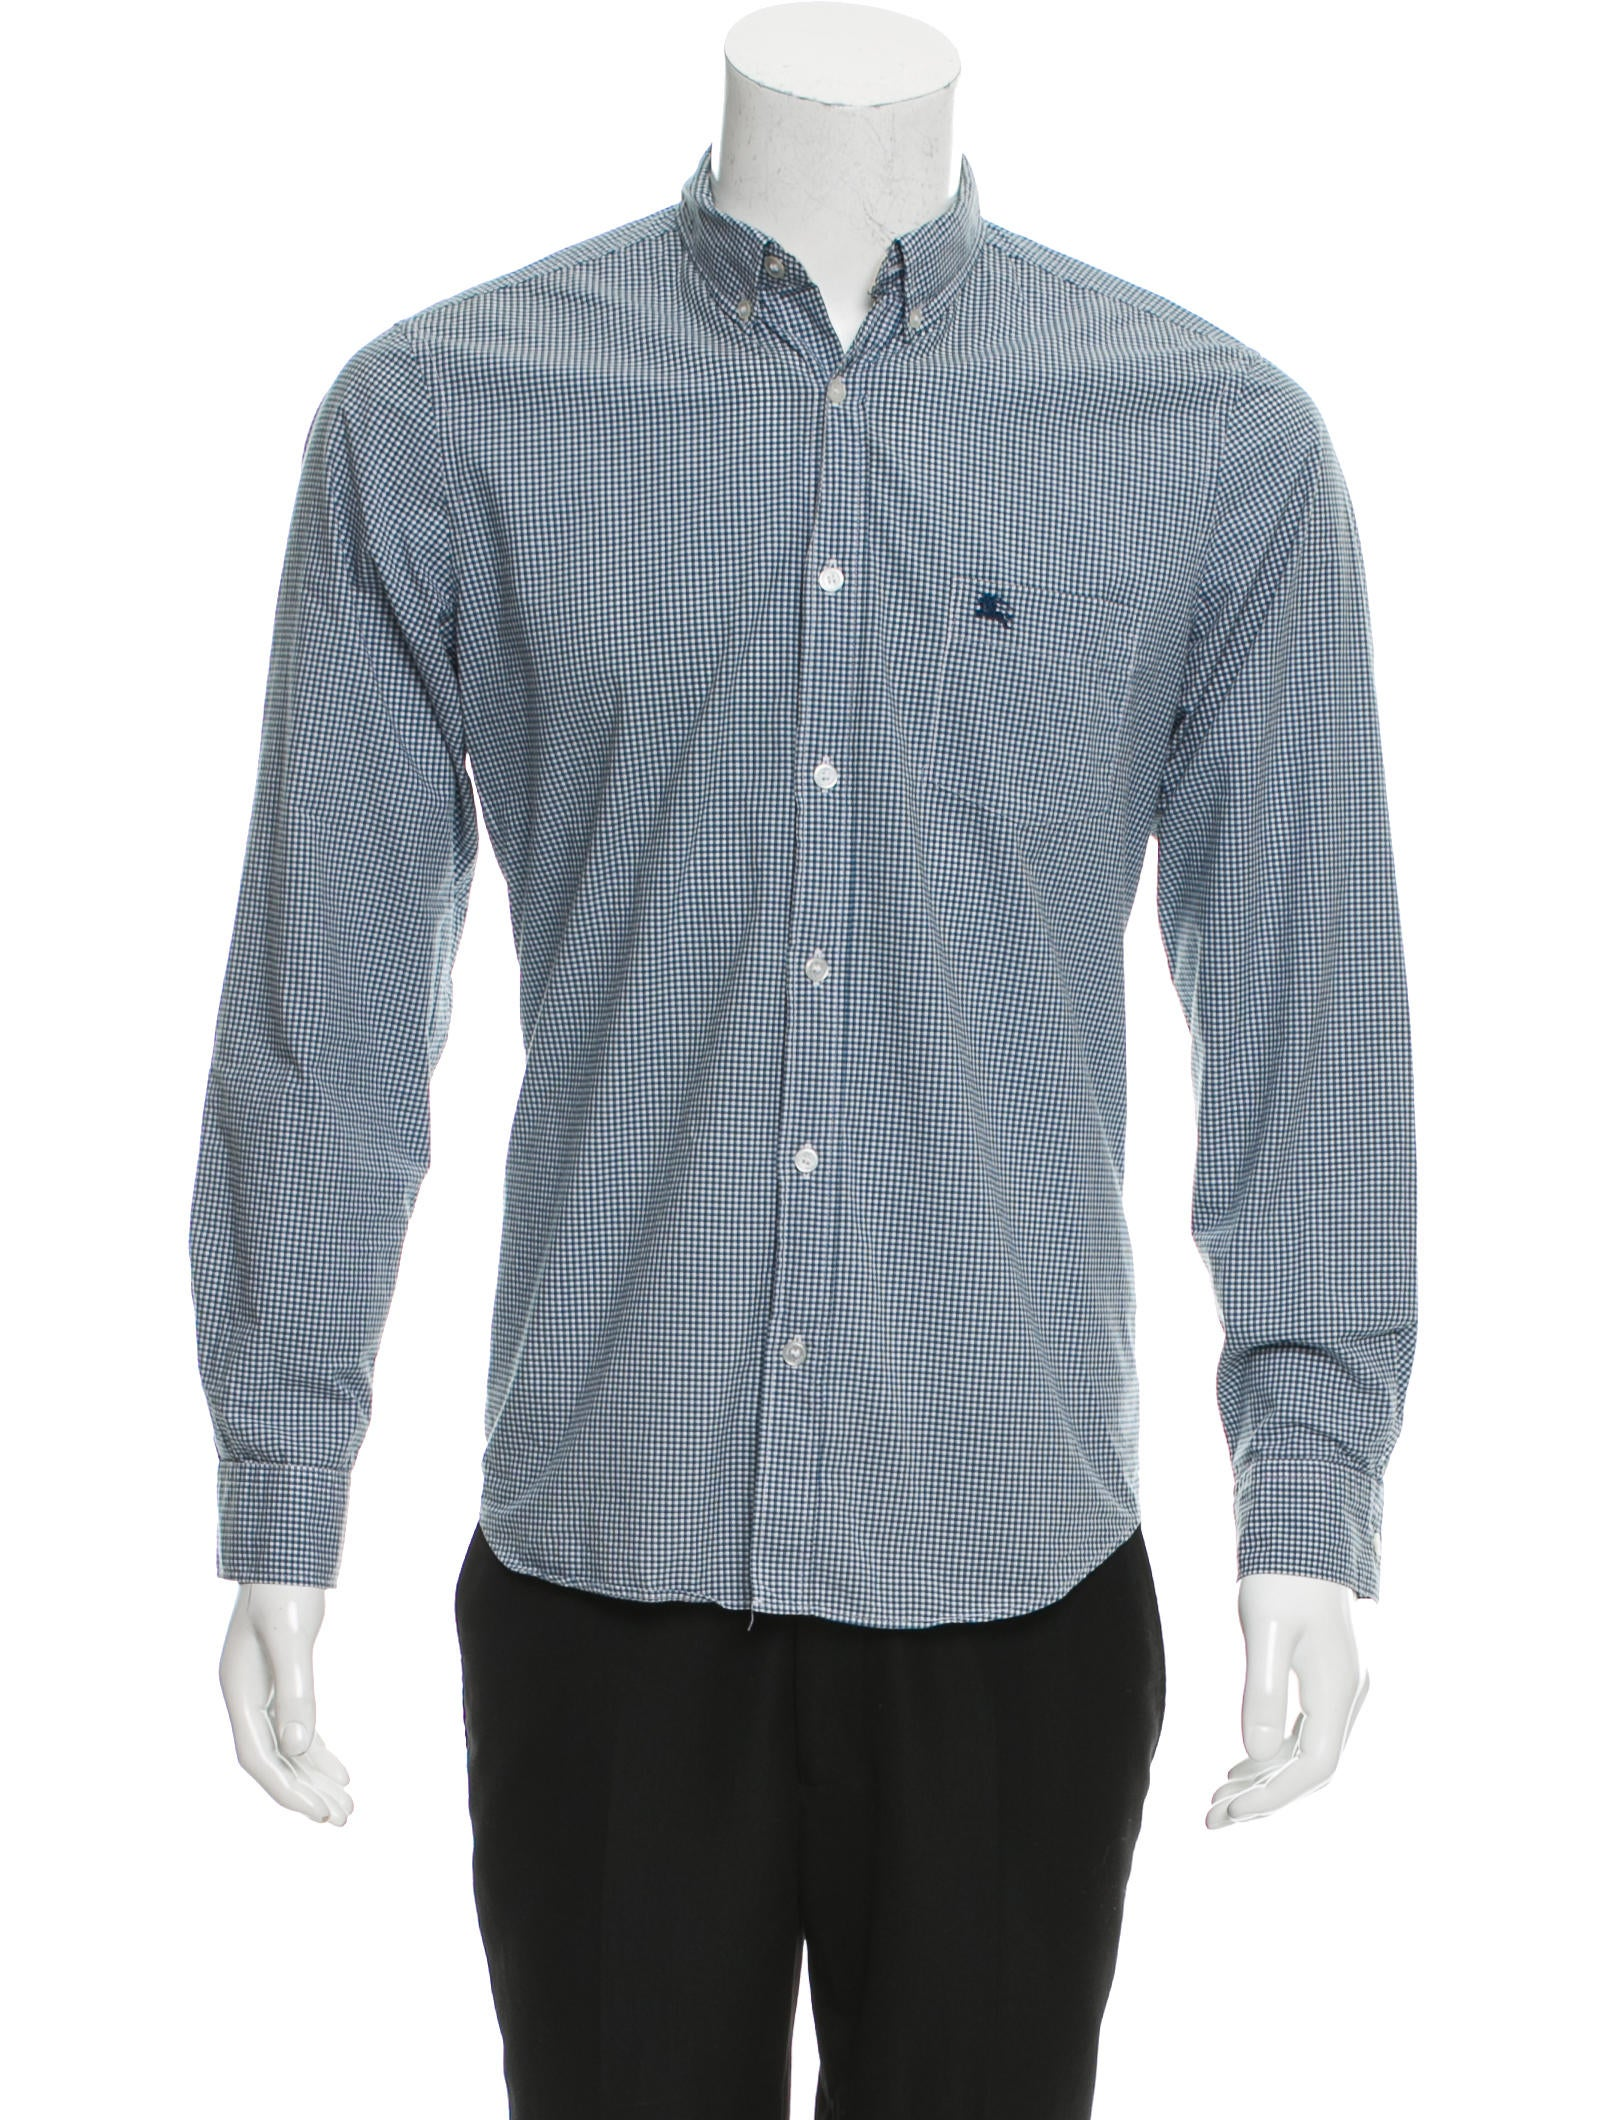 Burberry Brit Plaid Button Up Shirt Clothing Bbr26987